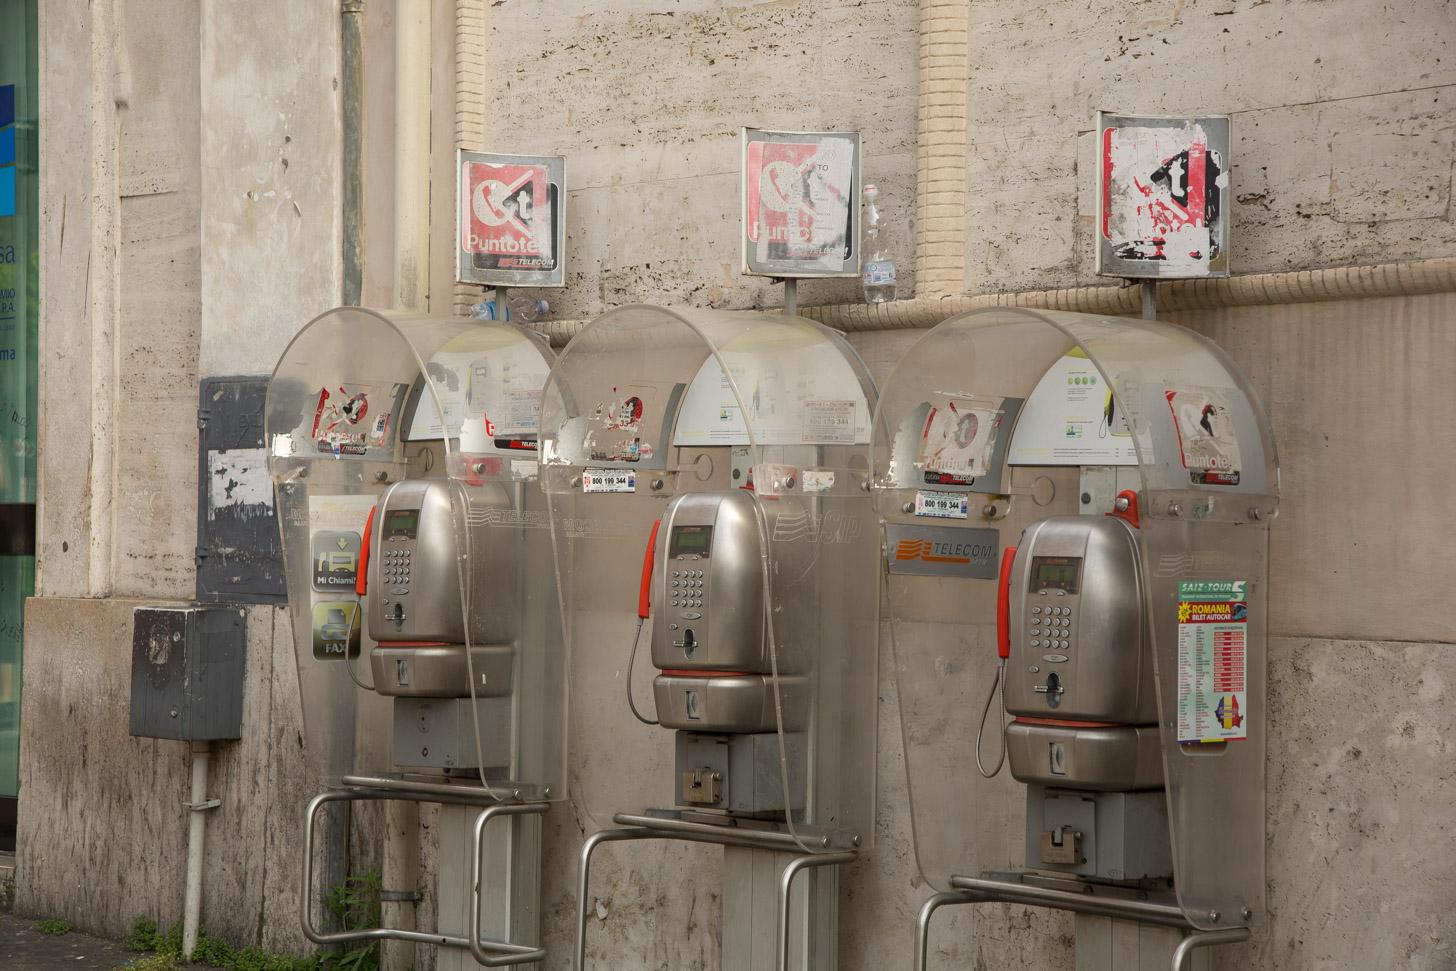 Telefoneren in Rome